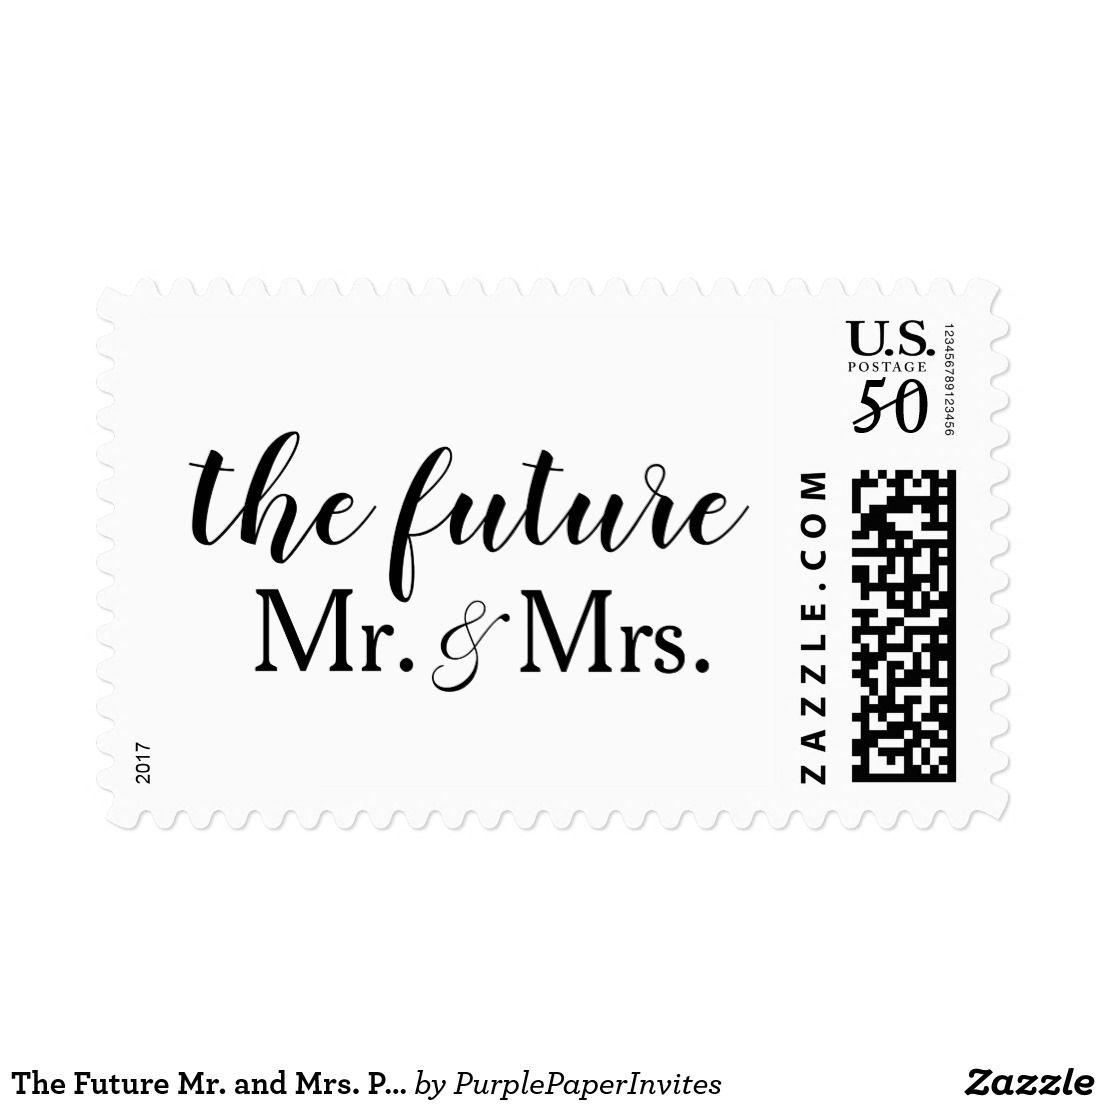 The Future Mr  and Mrs  Postage Stamps | Custom | Zazzle com